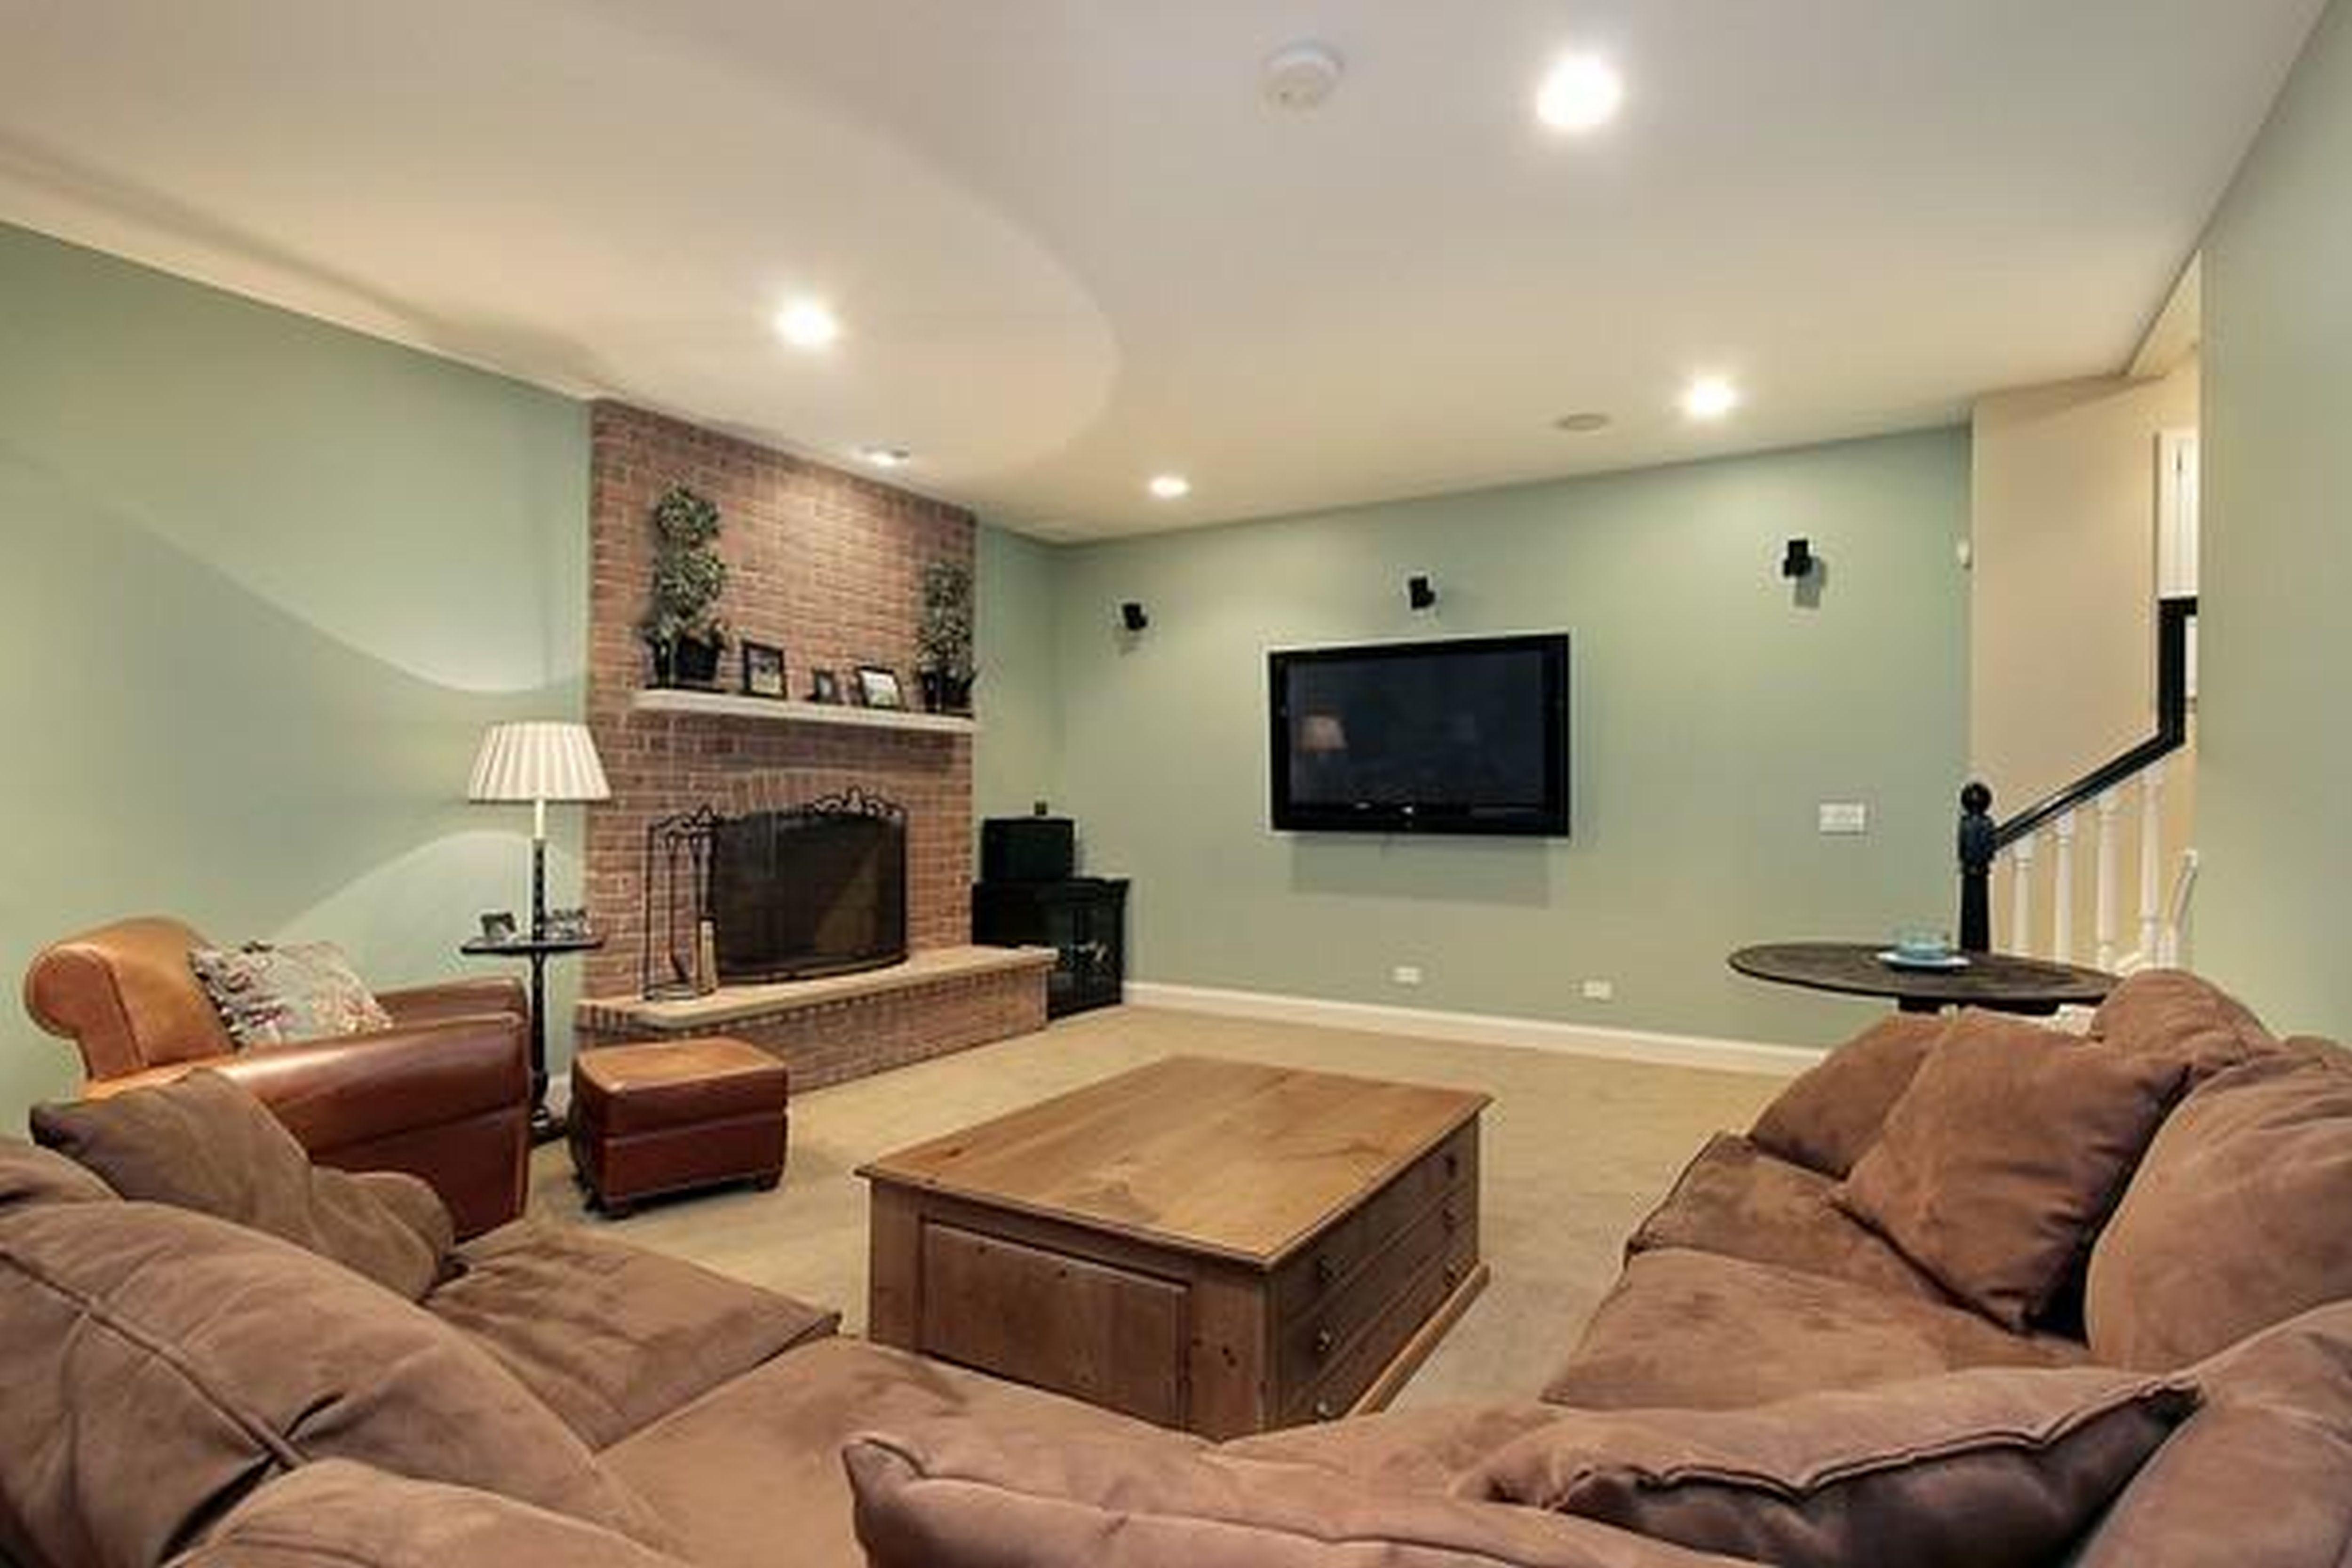 basement ideas on a budget. Awesome Rustic Basement Ideas Renovation Budget . On A